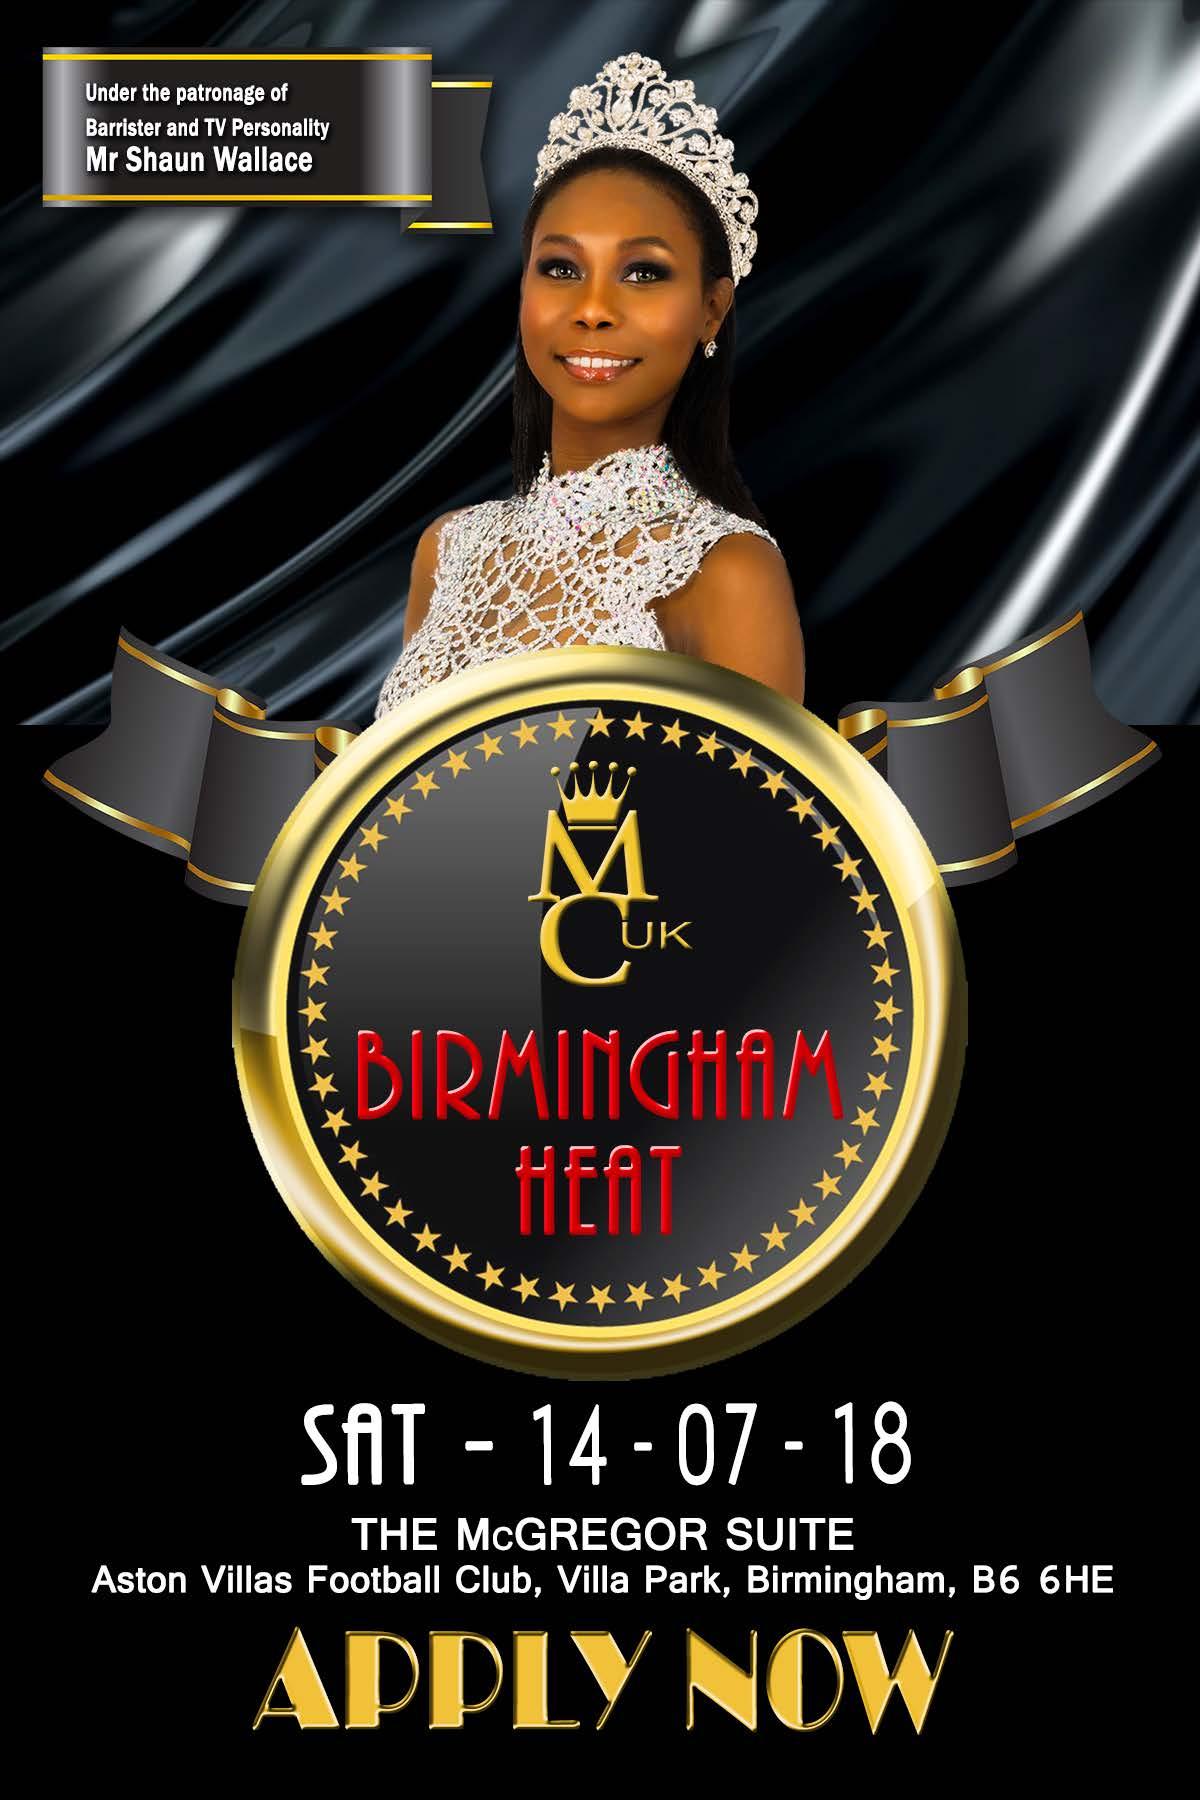 Miss Caribbean UK Birmingham Heat